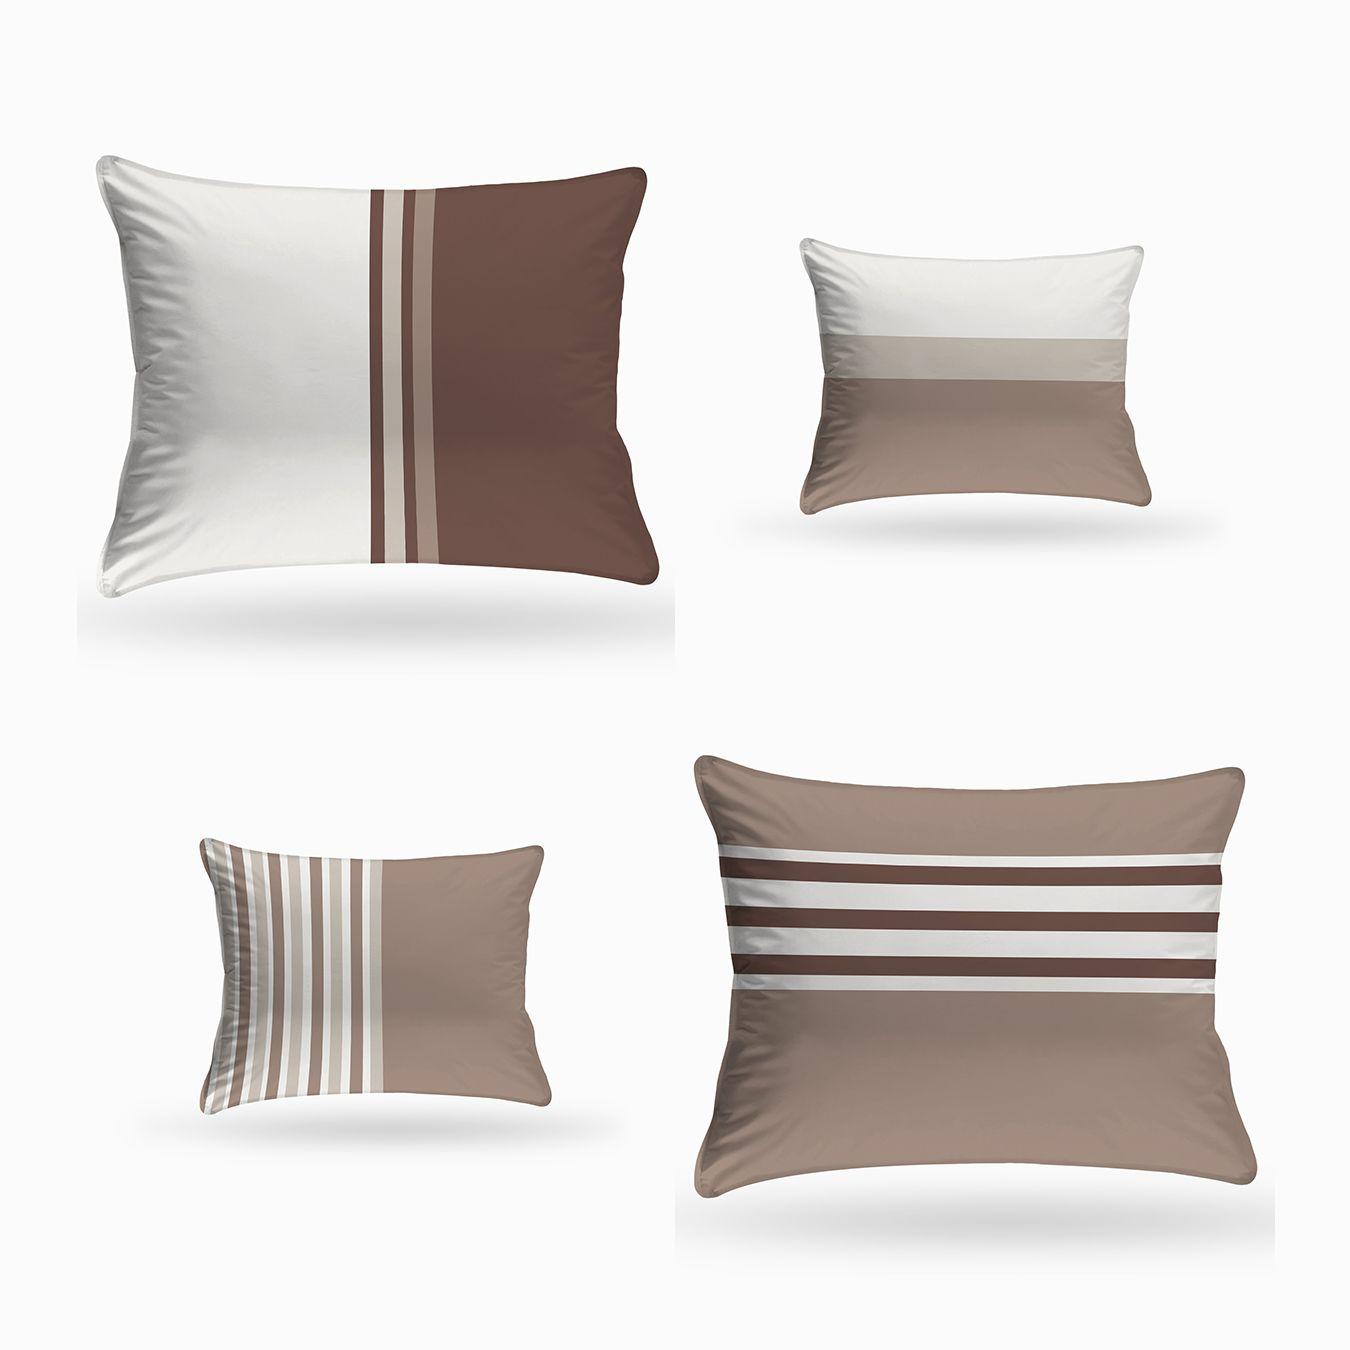 Beatris Veres Design Shop Redbubble Pillows Minimalist Pillows Trending Decor